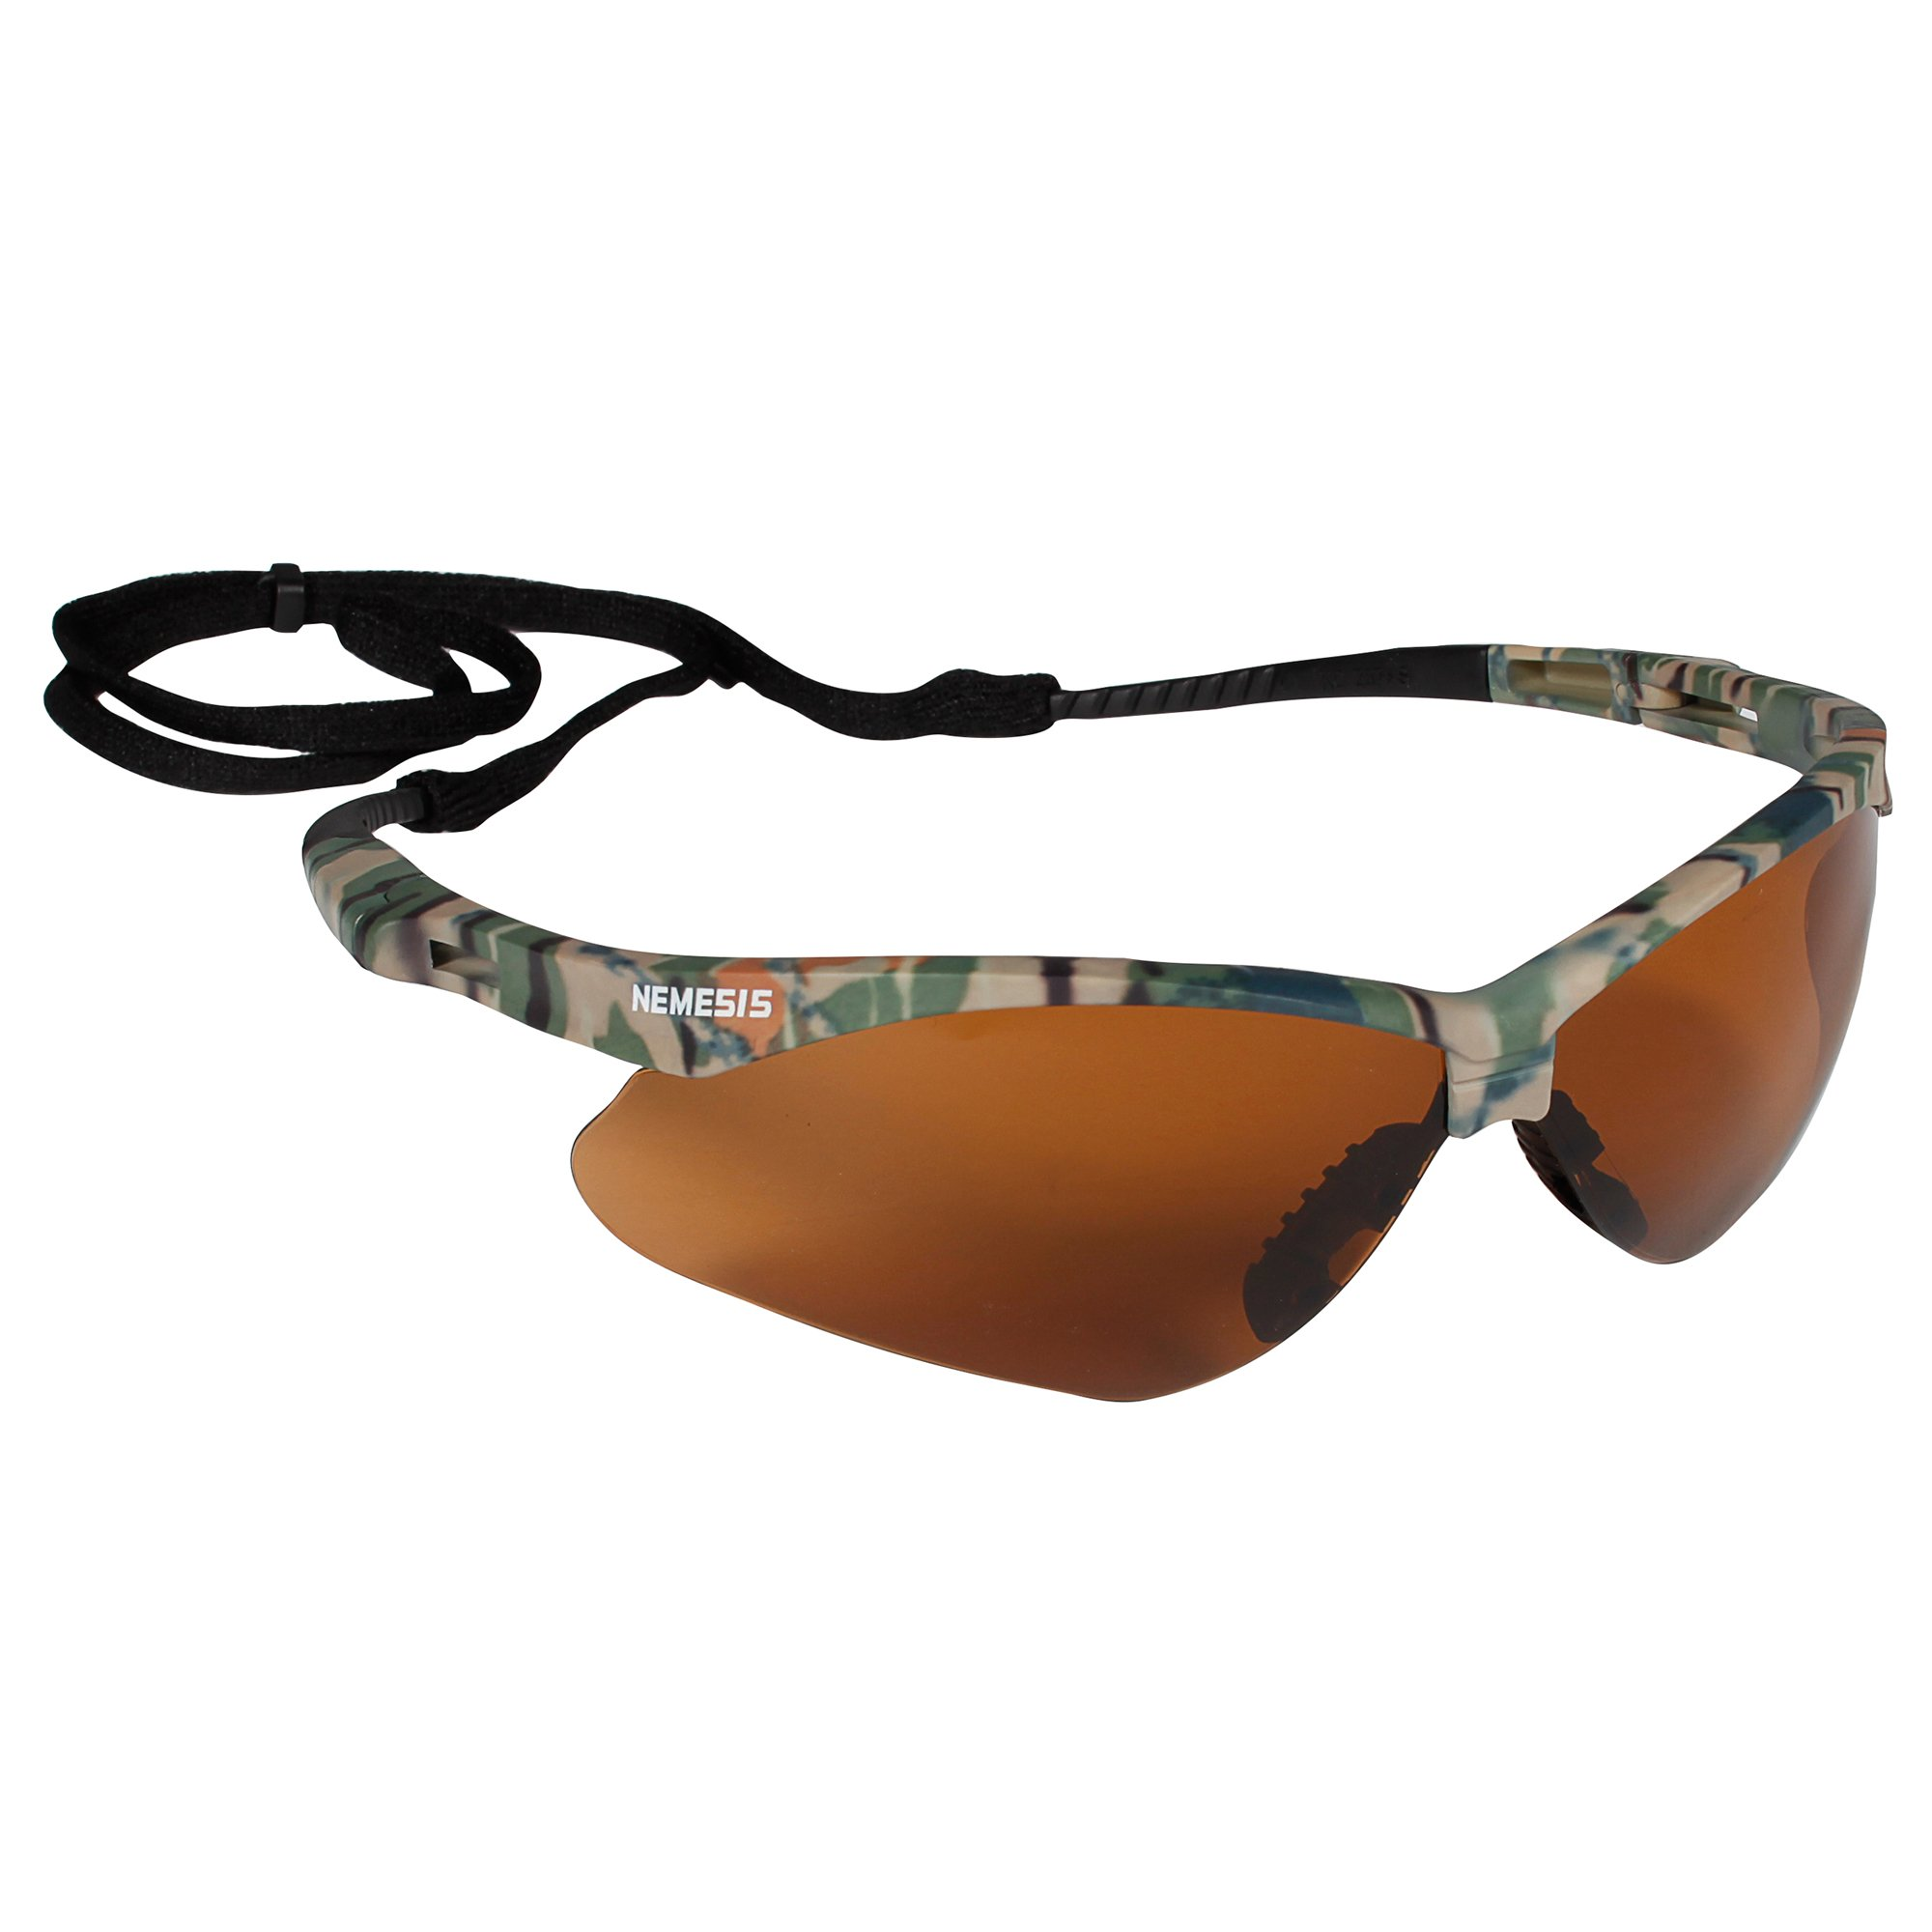 Jackson Safety V30 Nemesis Safety Glasses (19644), Bronze Lenses with Camo Frame, 12 Pairs/Case